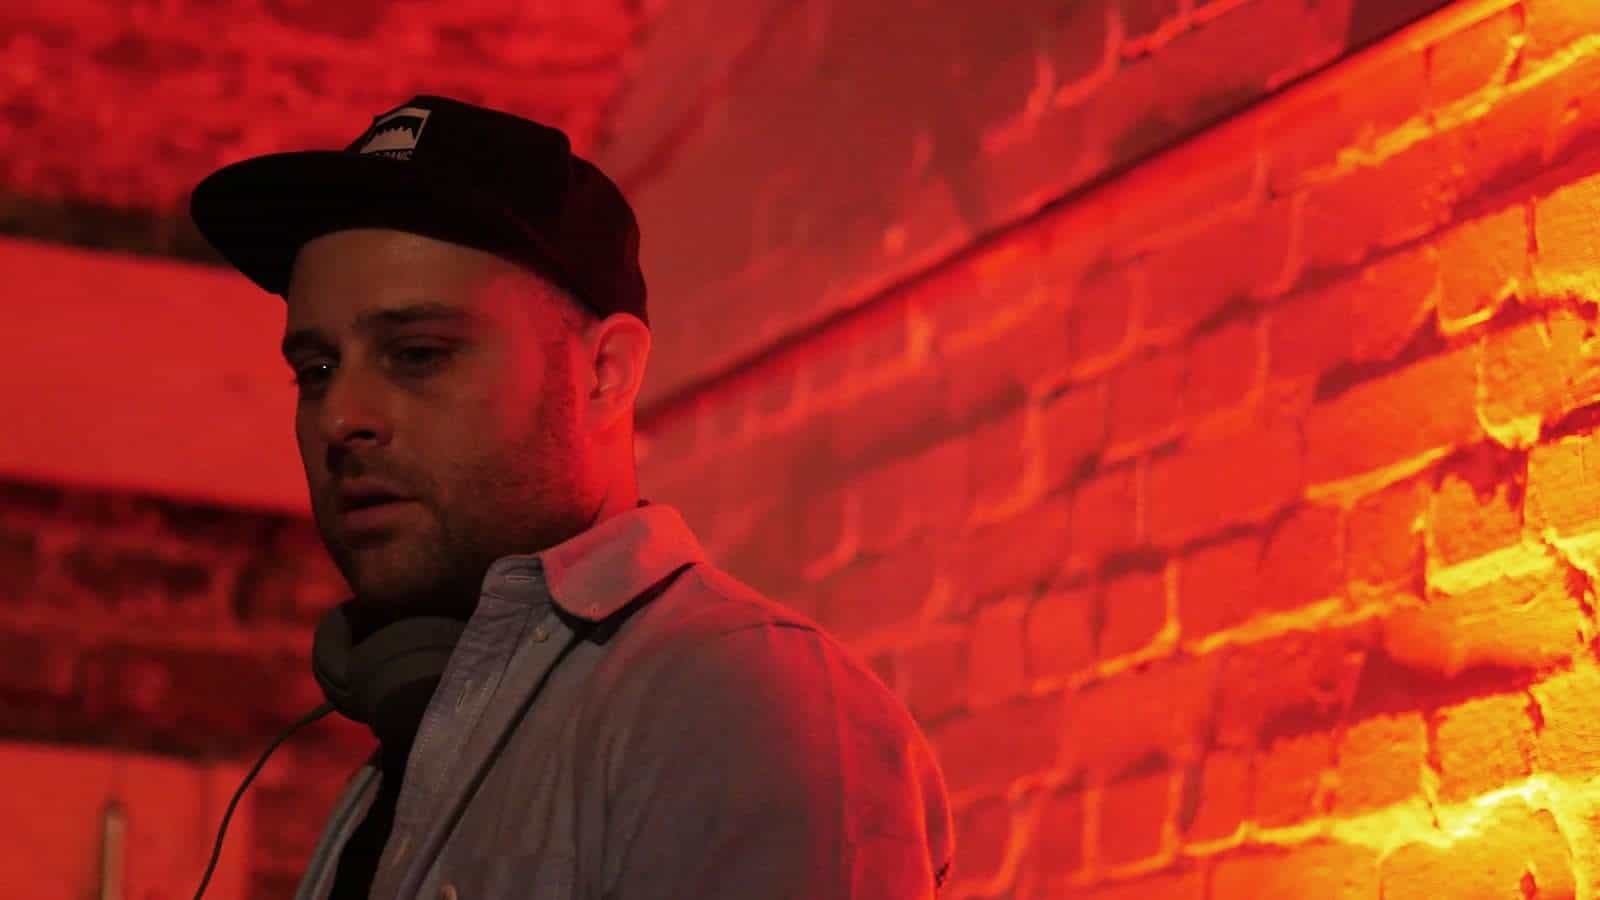 DJ & producer The Last Skeptik